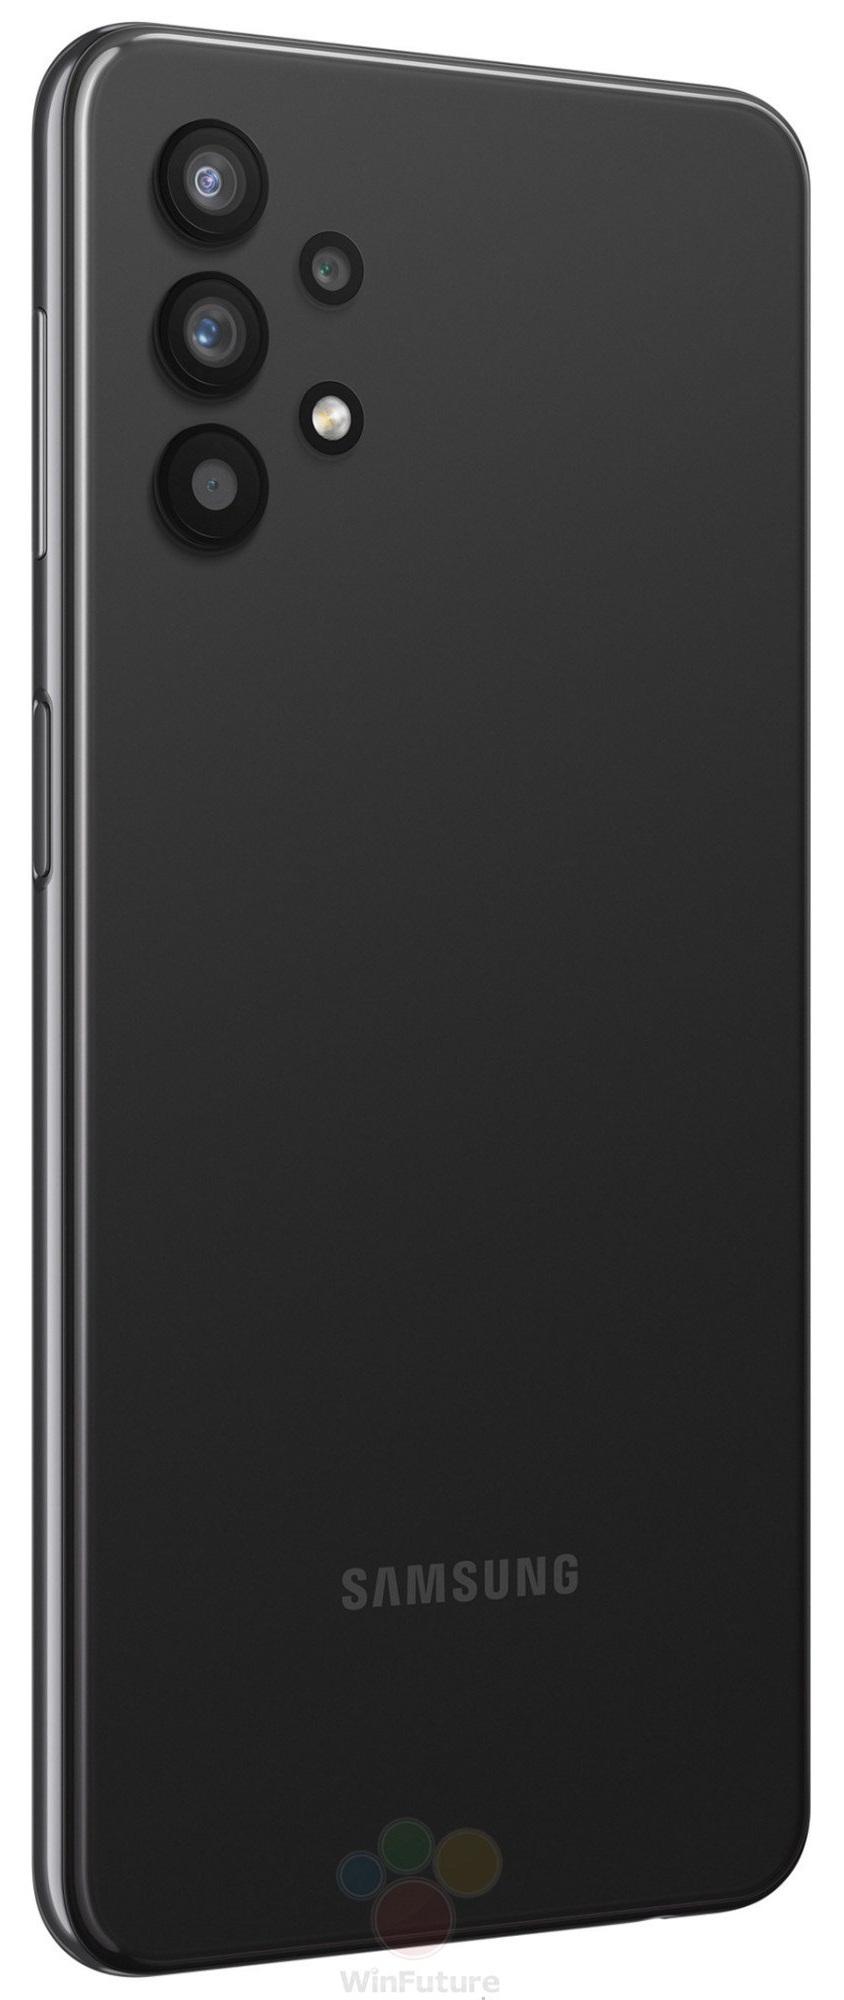 Samsung Galaxy A32: самый доступный смартфон от Samsung с 5G. Фото Samsung  - galaxy_a32_samyj_dostupnyj_samsung_s_5g_bez_bloka_pod_kameru_na_foto_14